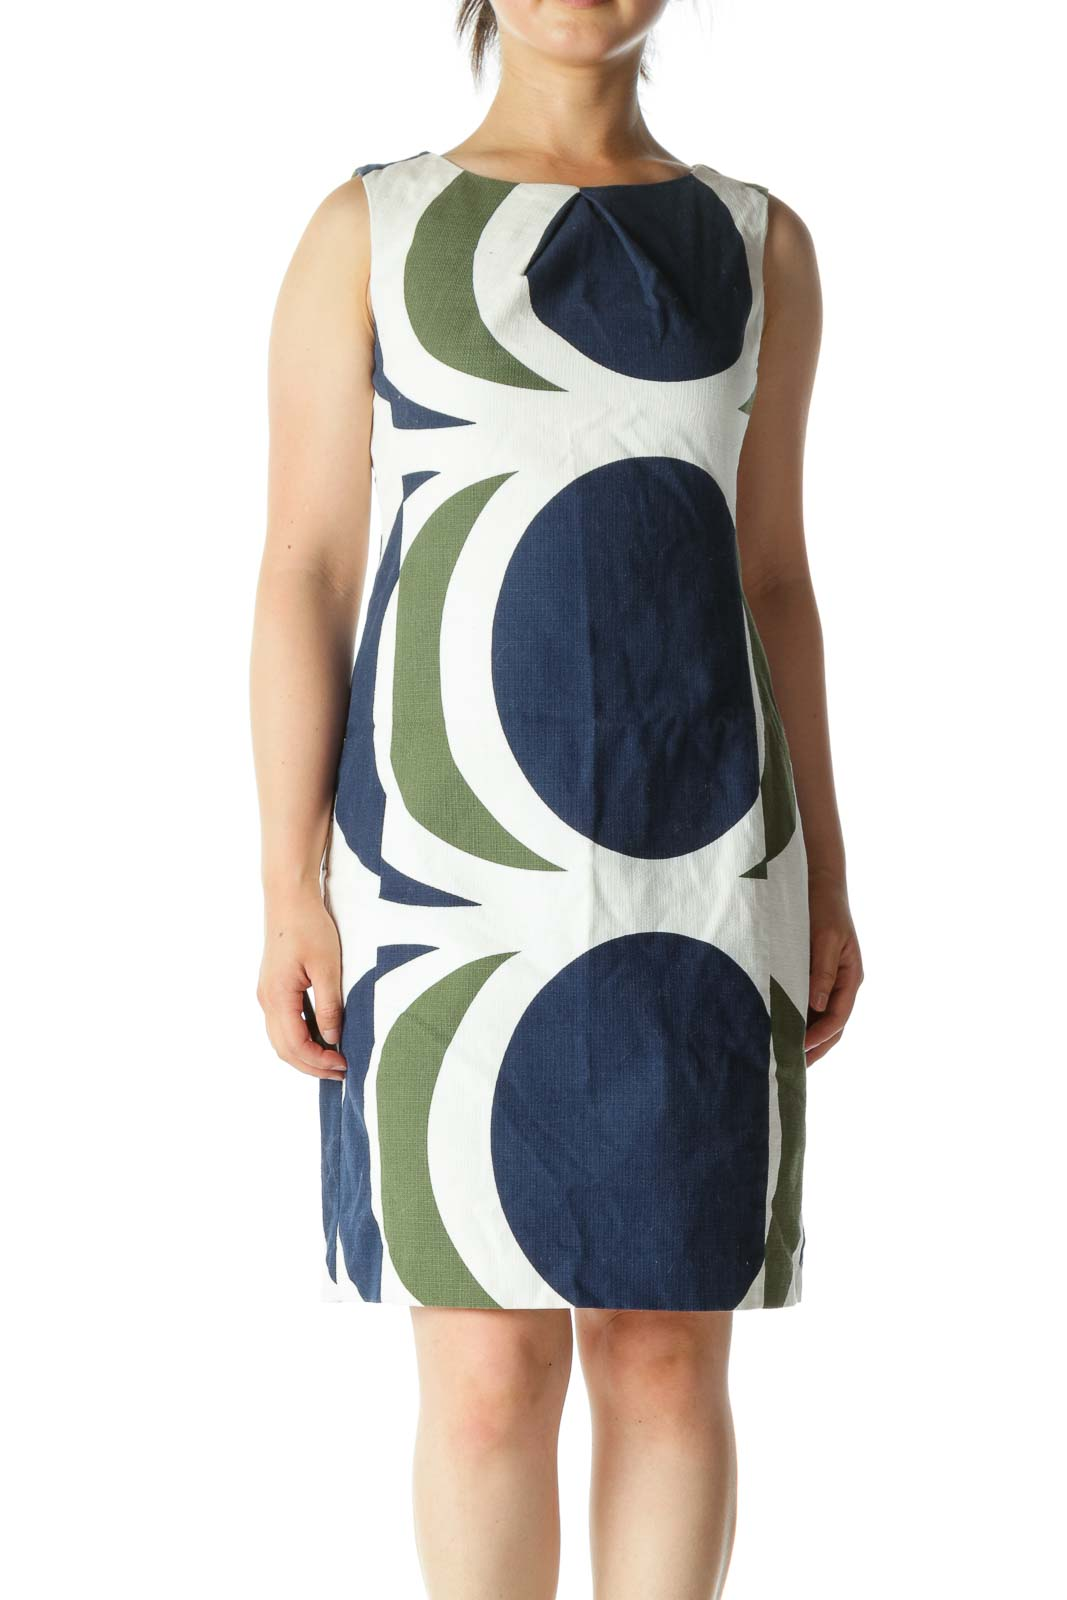 White Blue Green Cotton Blend Knit Textured Print Dress Front